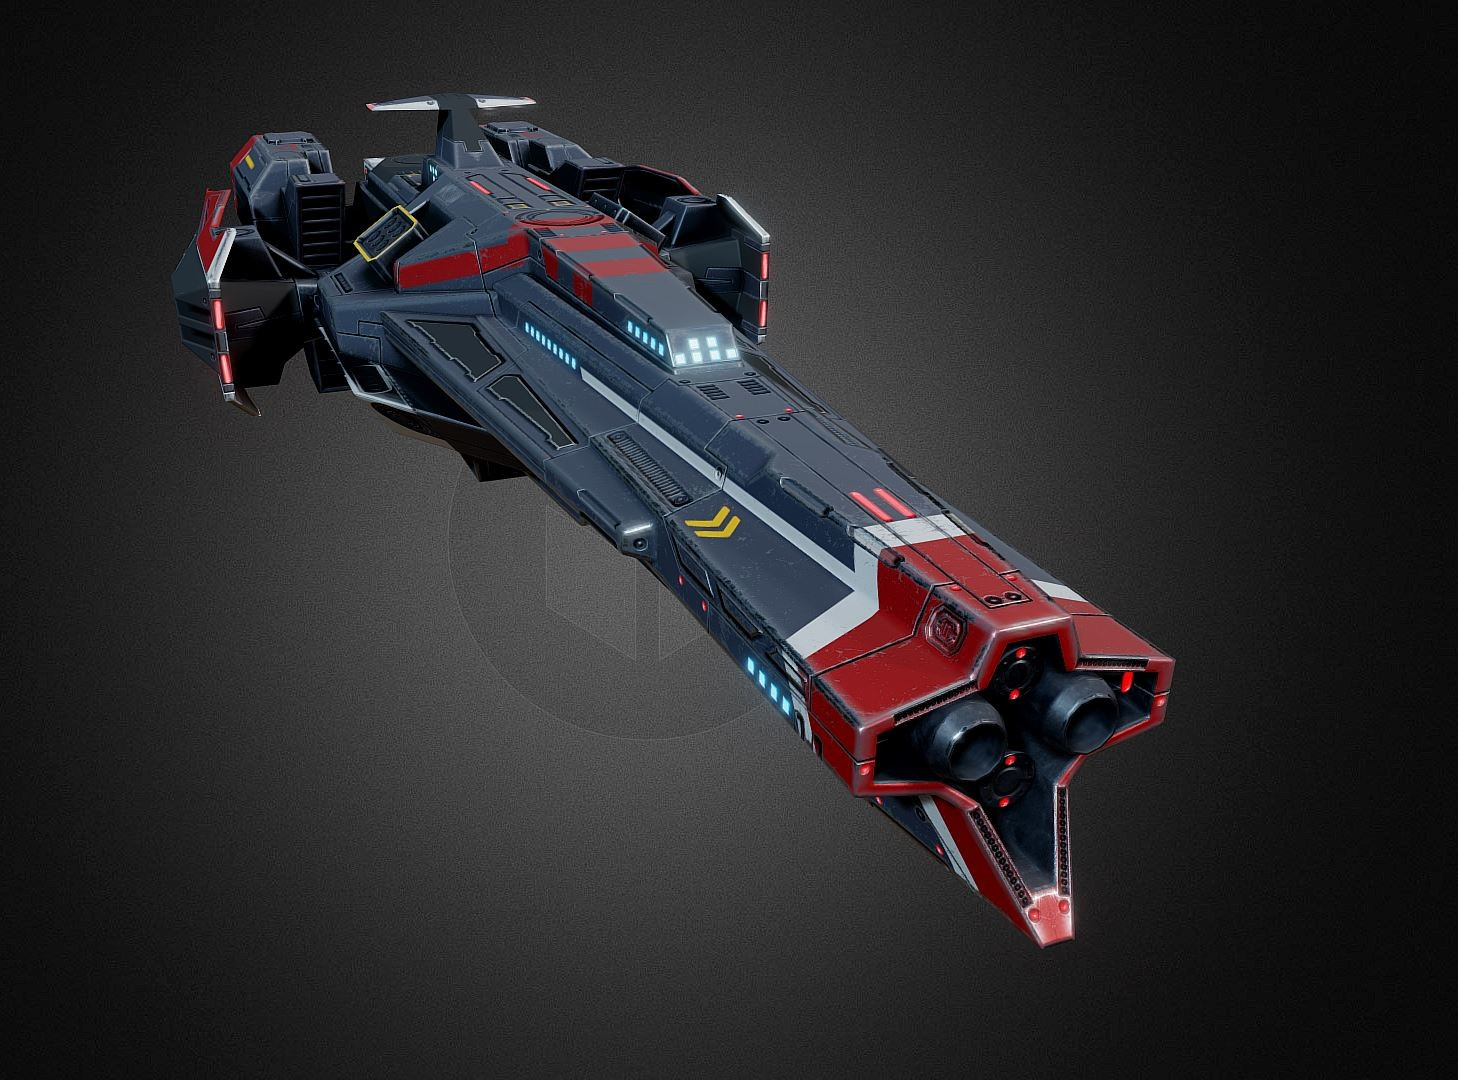 future rocket ship - HD1458×1080